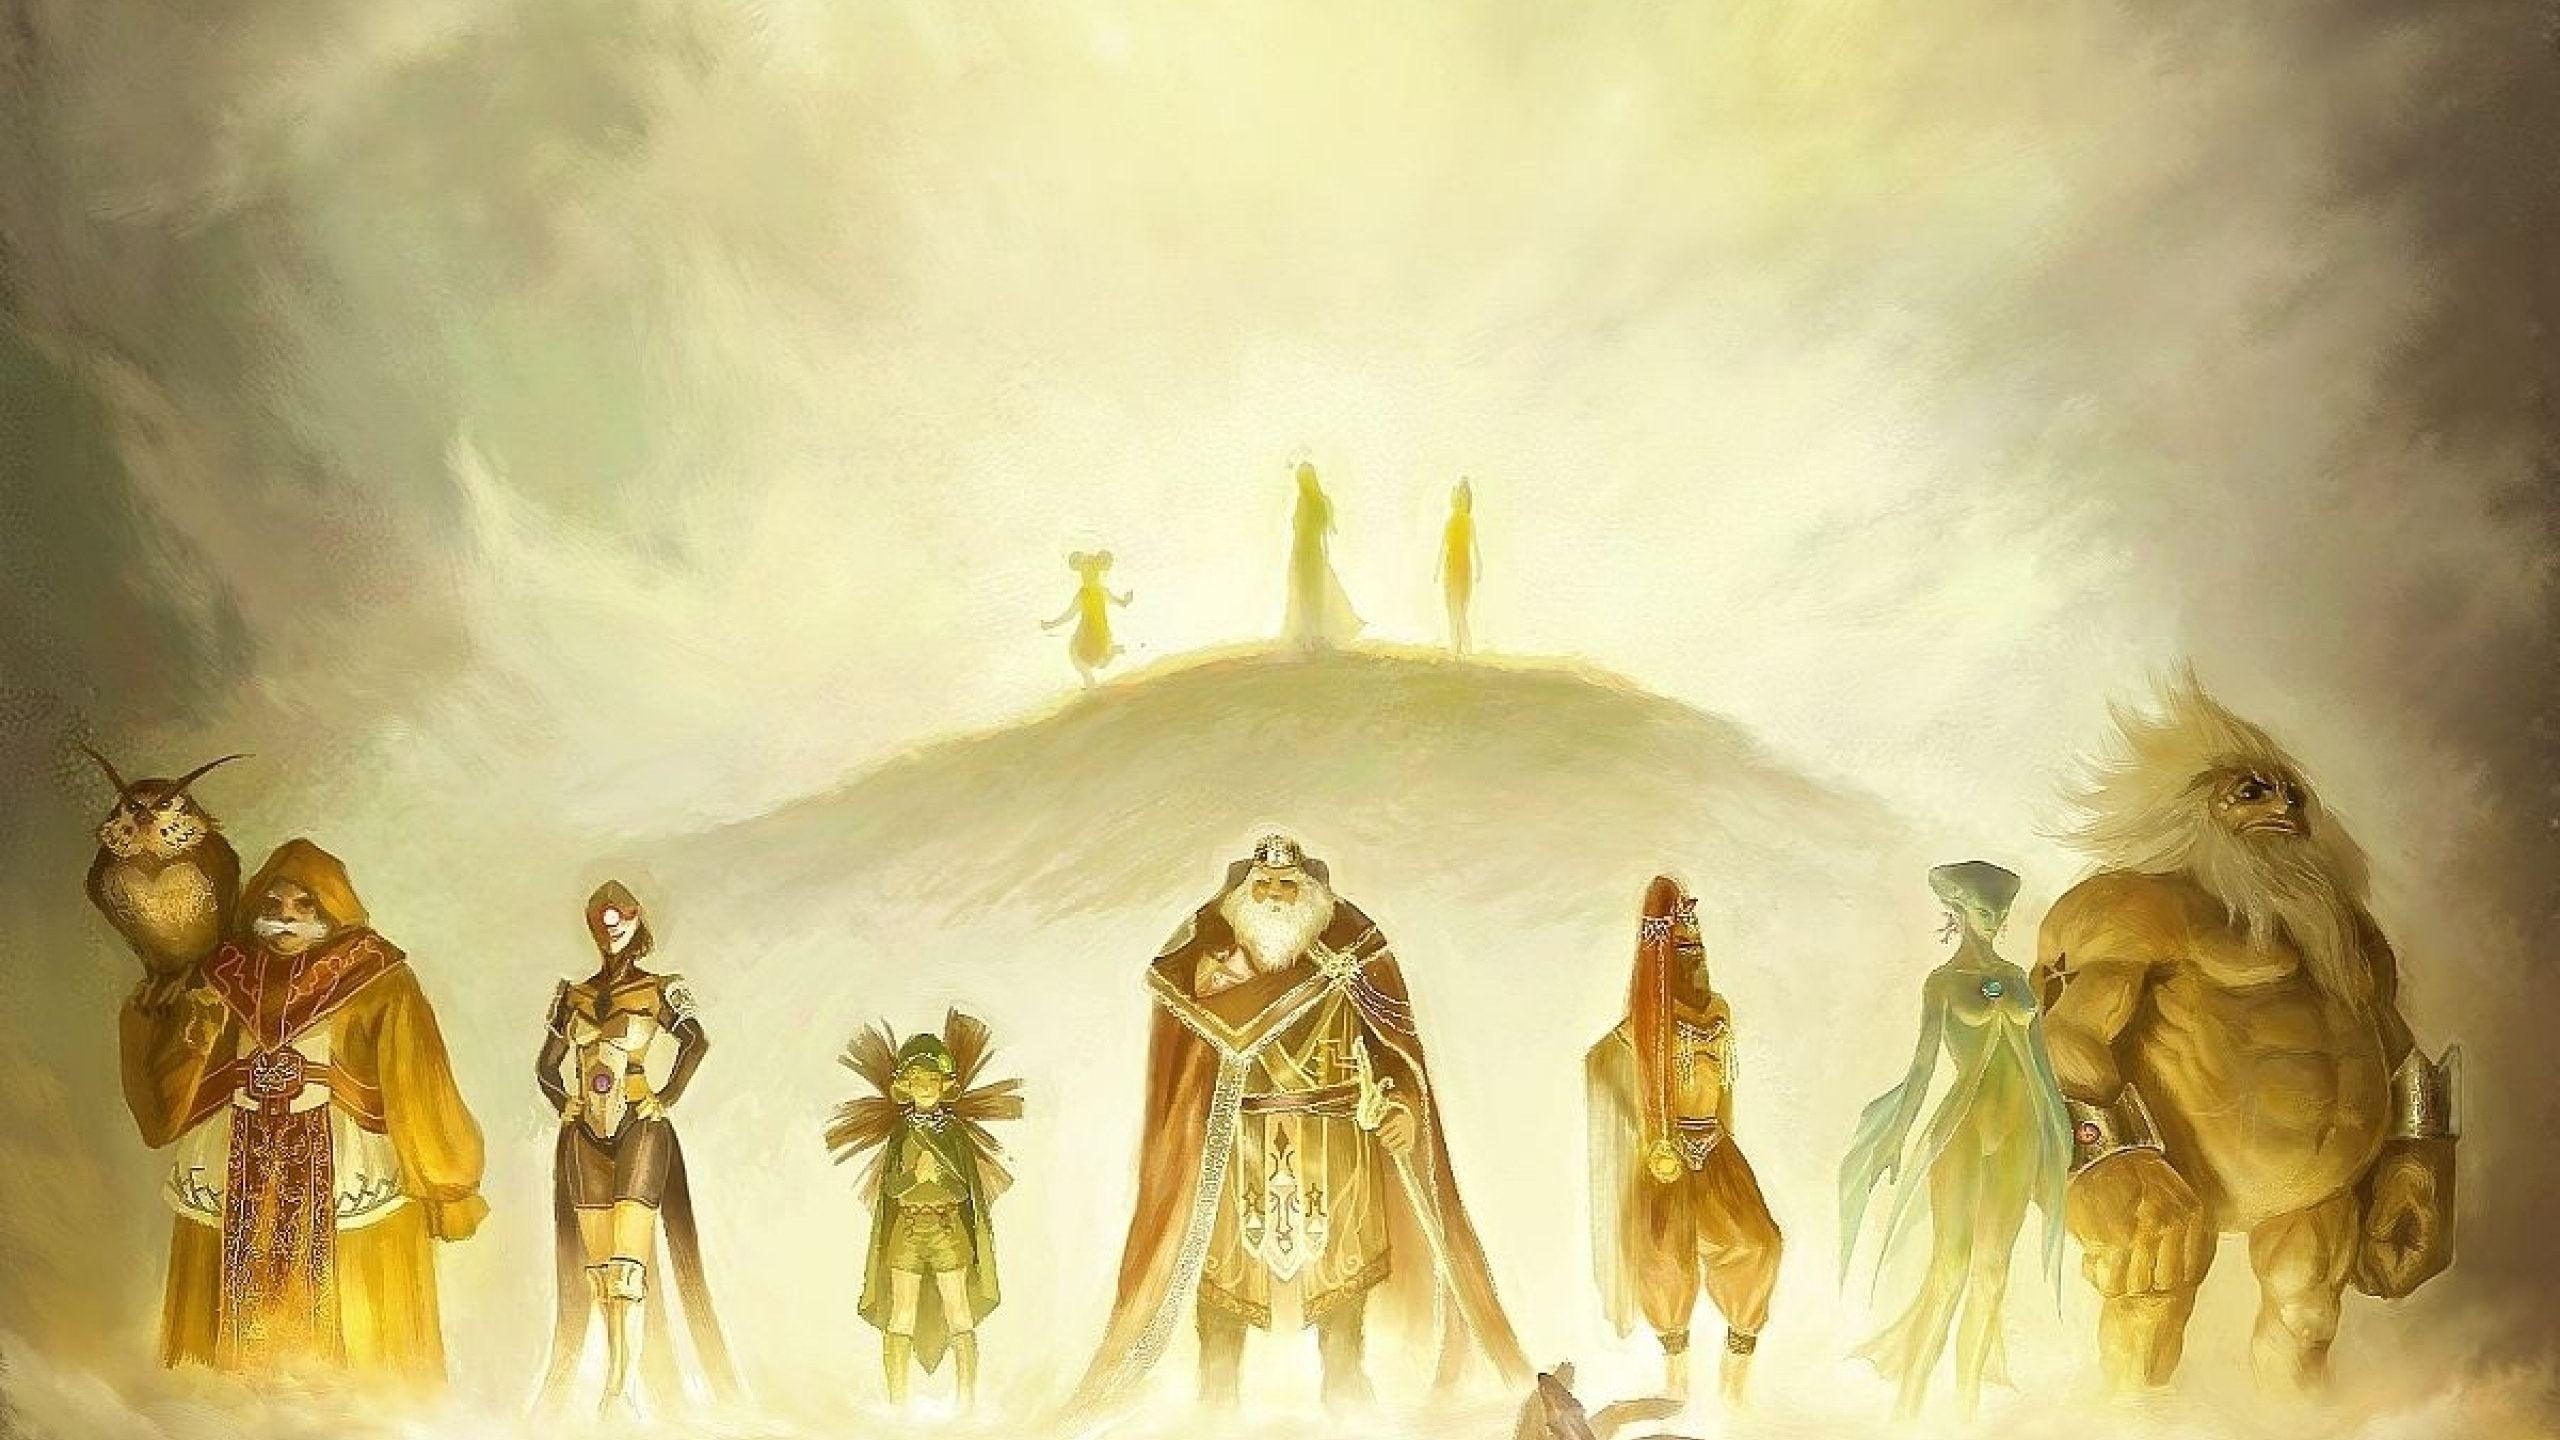 Legend Of Zelda Twilight Princess Wallpapers High Resolution For Desktop  Wallpaper 2560 x 1440 px 1.08